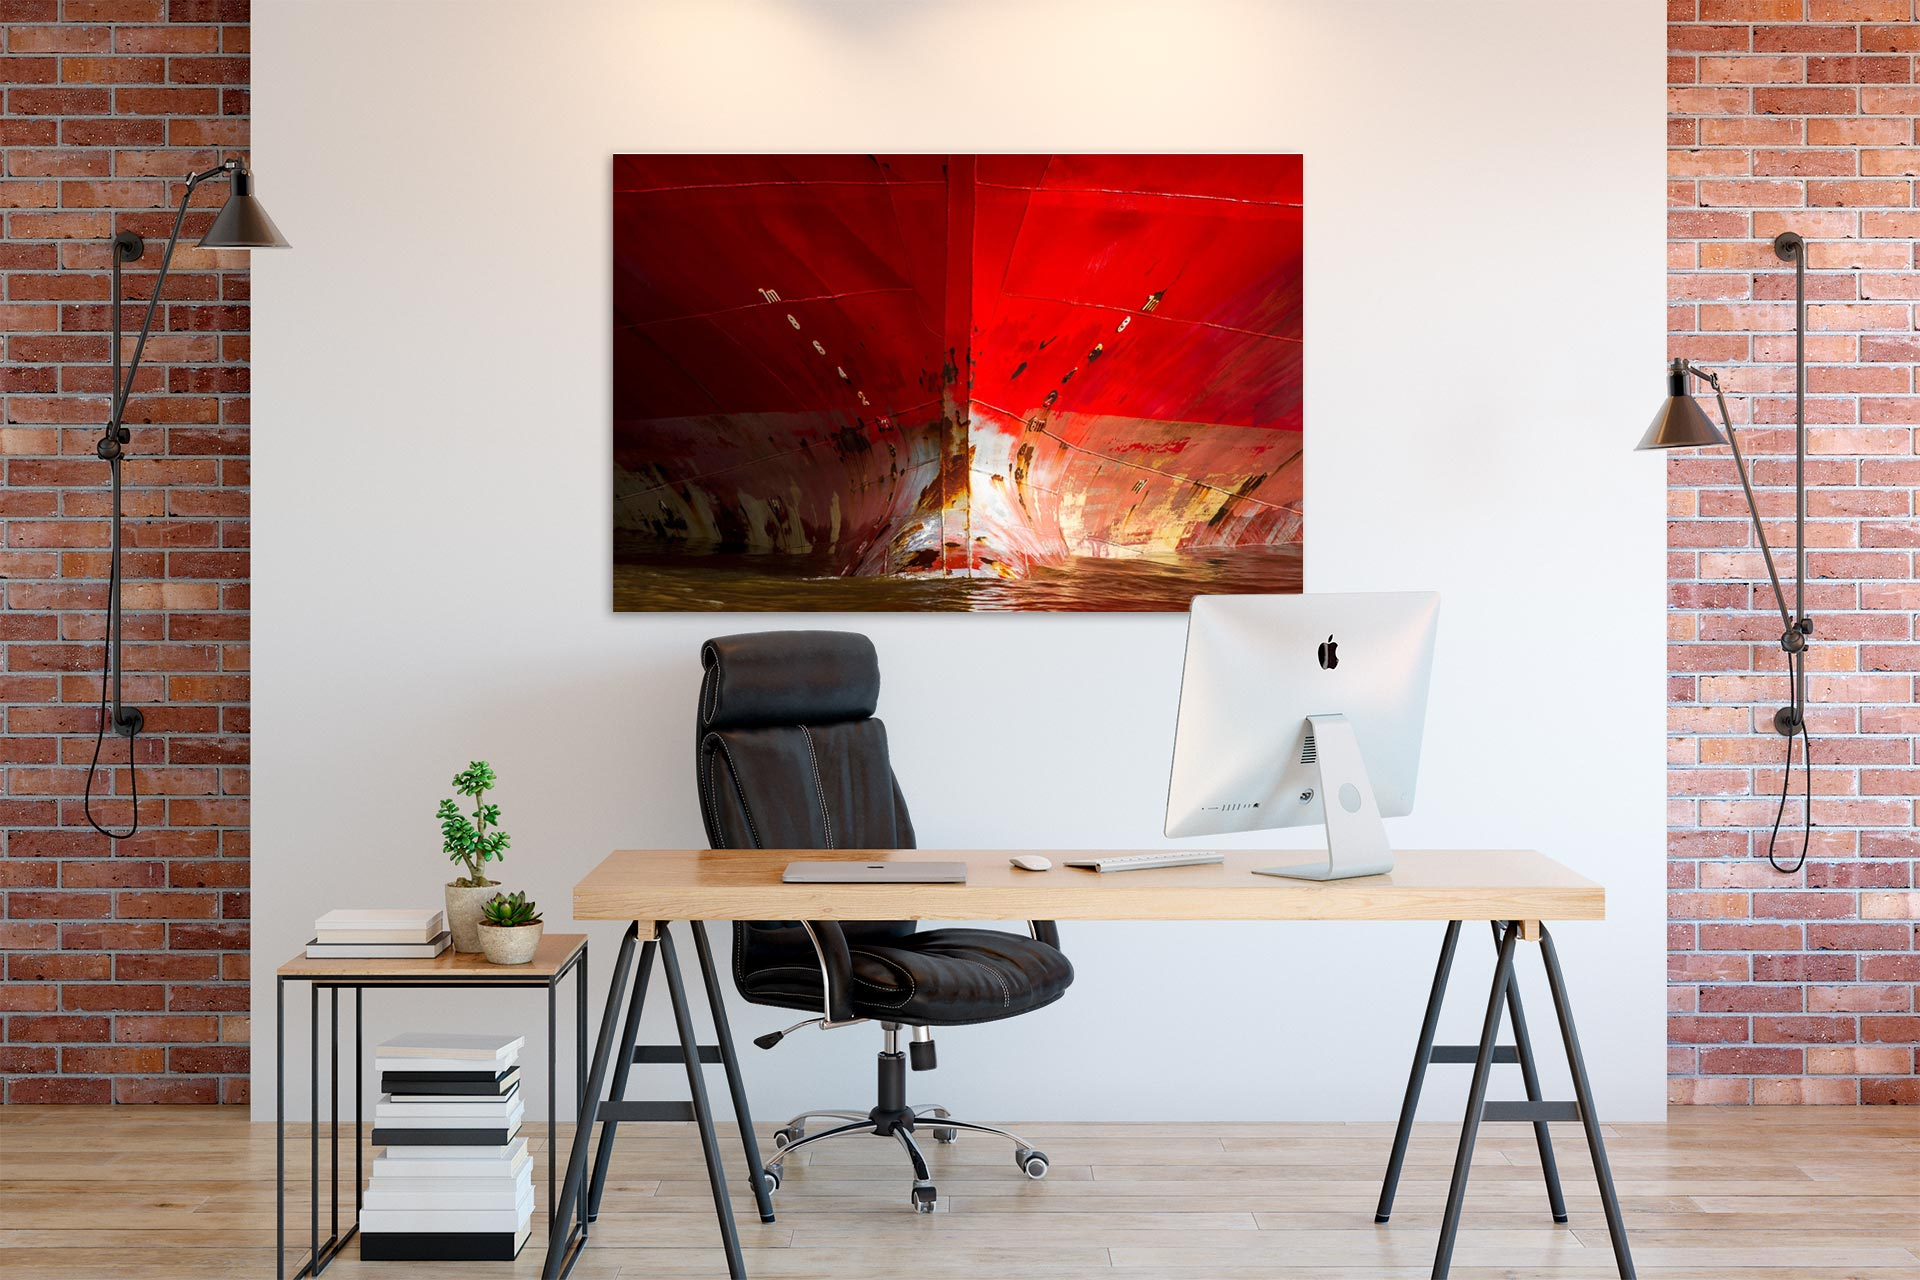 JS001-der-rote-bug-wandbild-bild-auf-leinwand-acrylglas-aludibond-buero